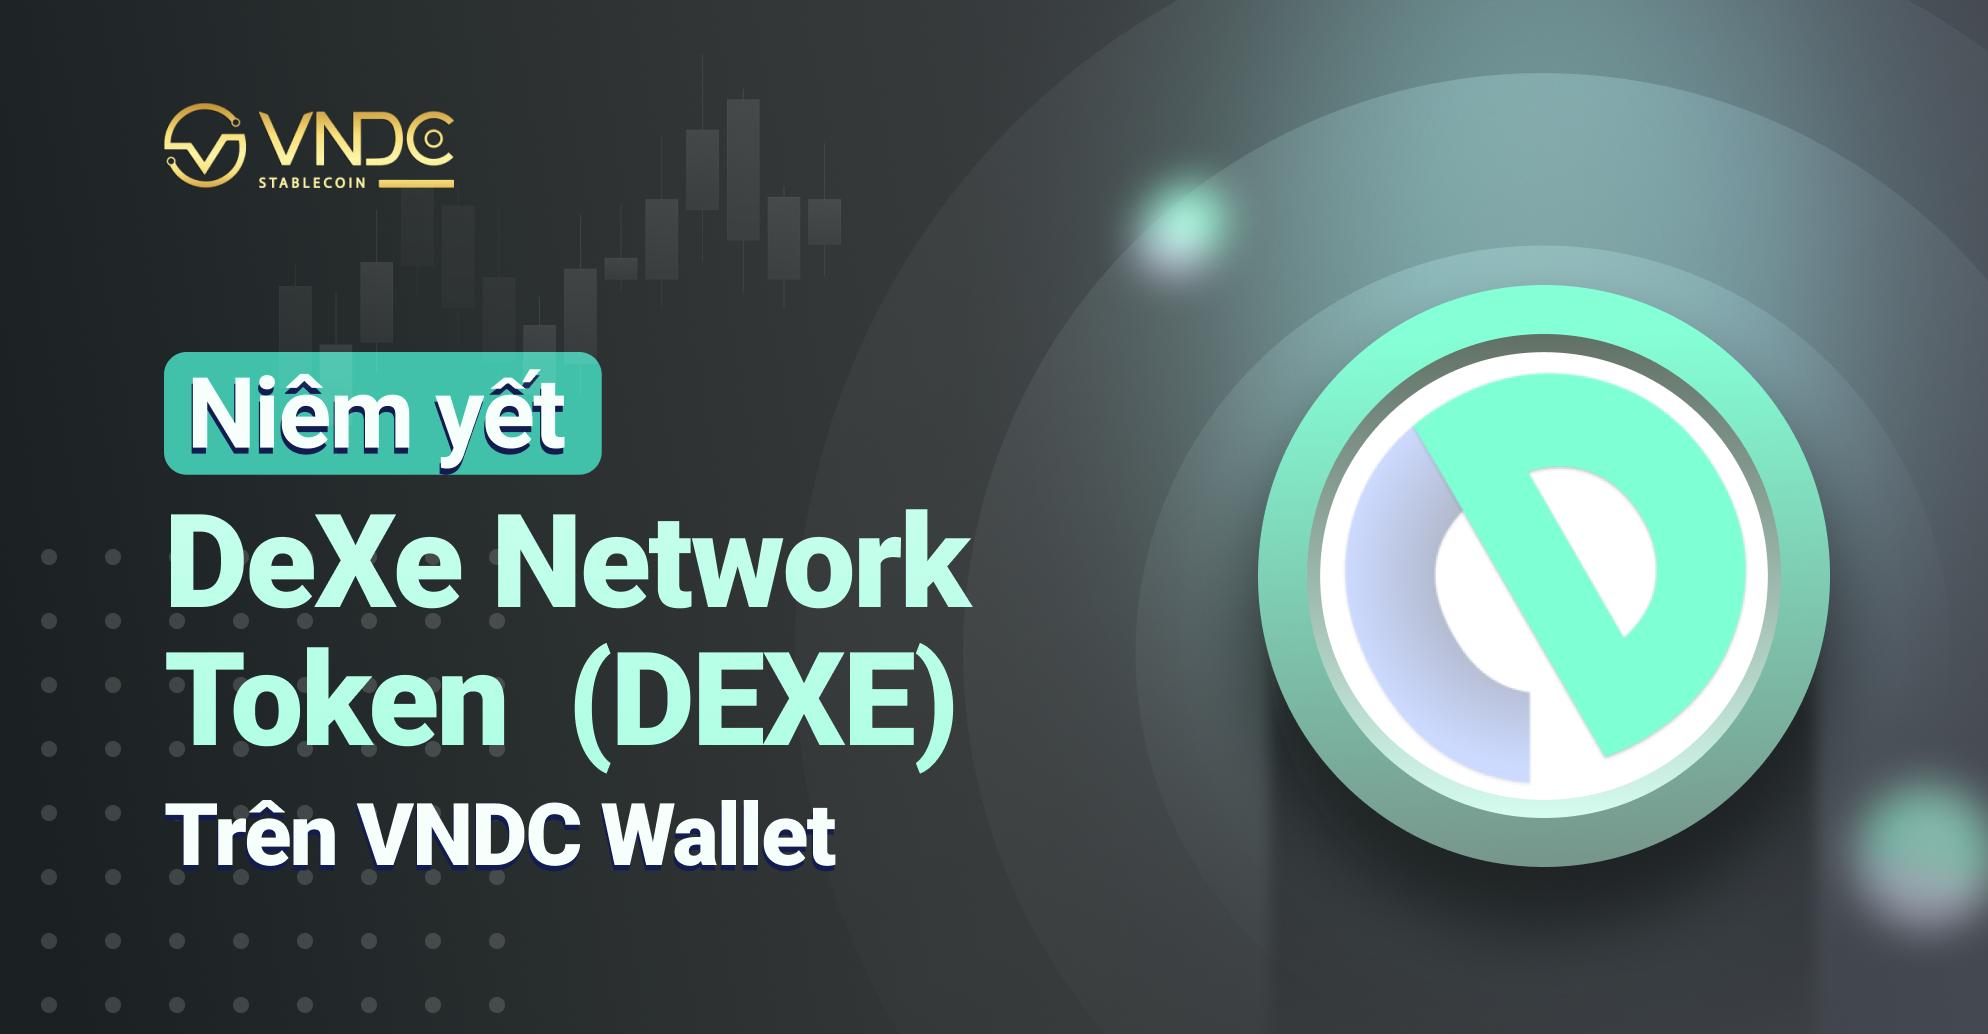 Niêm yết DeXe Network Token (DEXE) trên VNDC Wallet